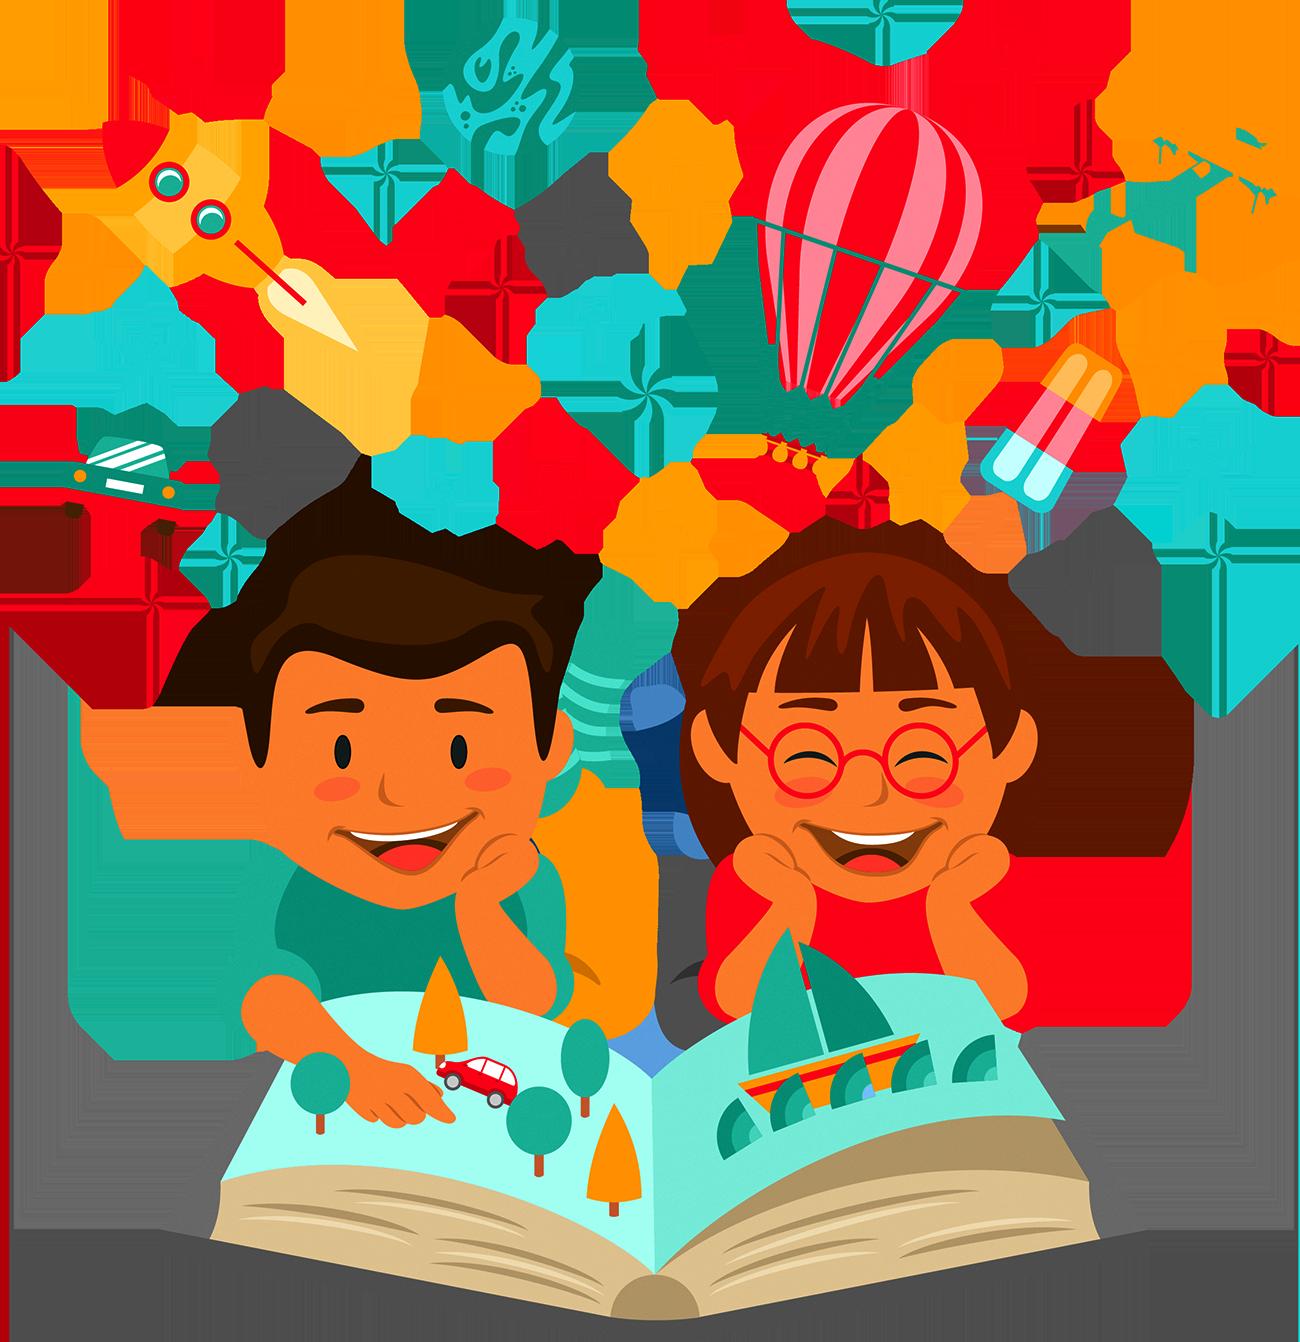 Clipart reading education. Child learning illustration children